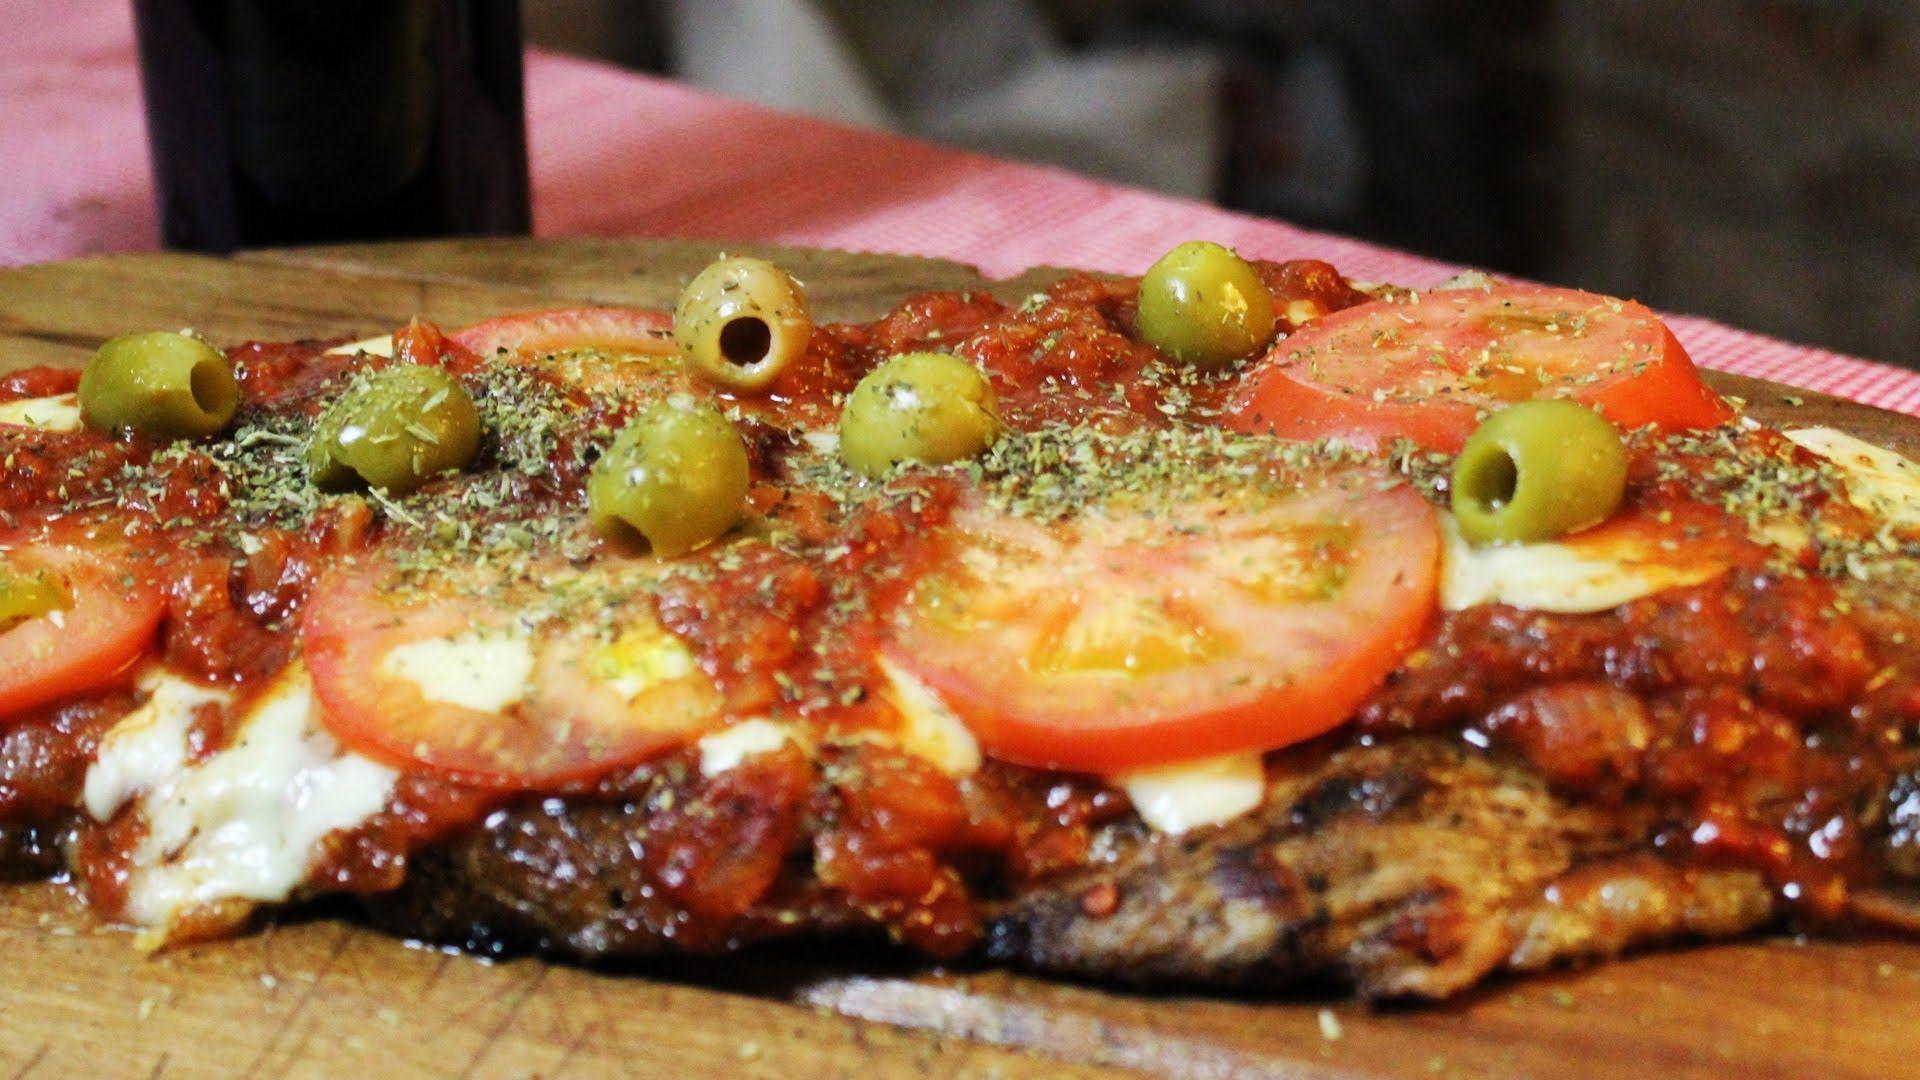 Como Hacer Matambre A La Pizza Napolitana En La Parrilla Locos X El Asado Matambre De Cerdo Matambre Pizza A La Parrilla